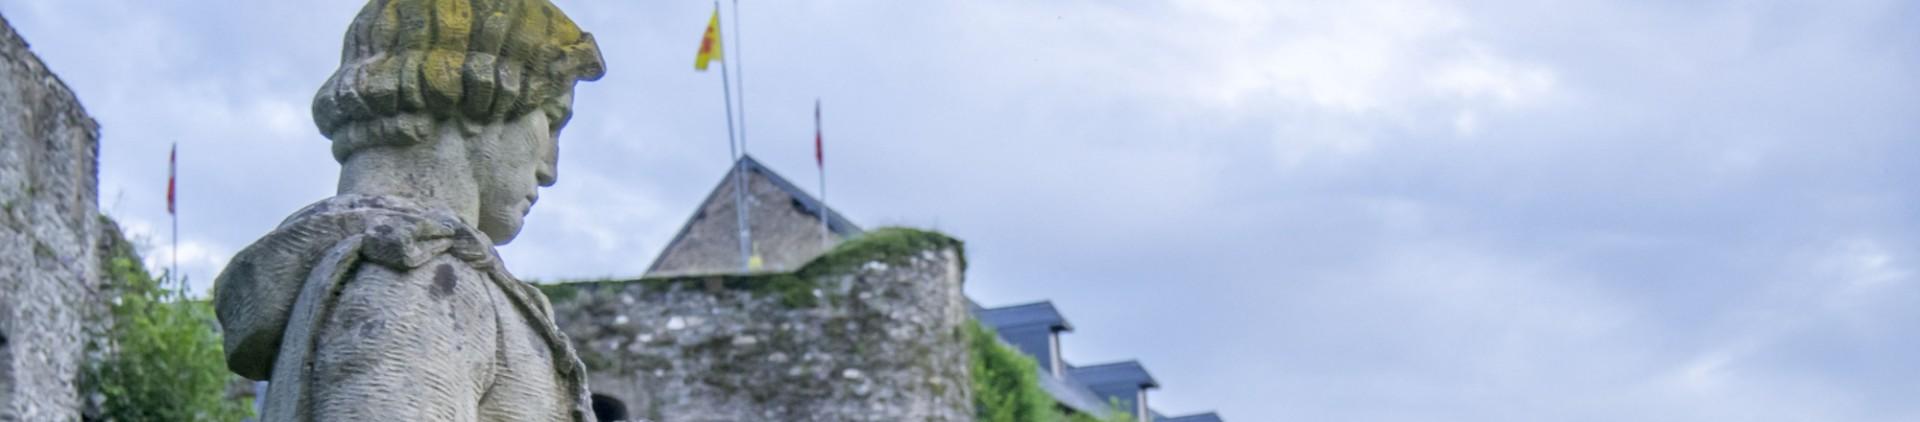 Kastelen en erfgoed - Ardenne Incoming